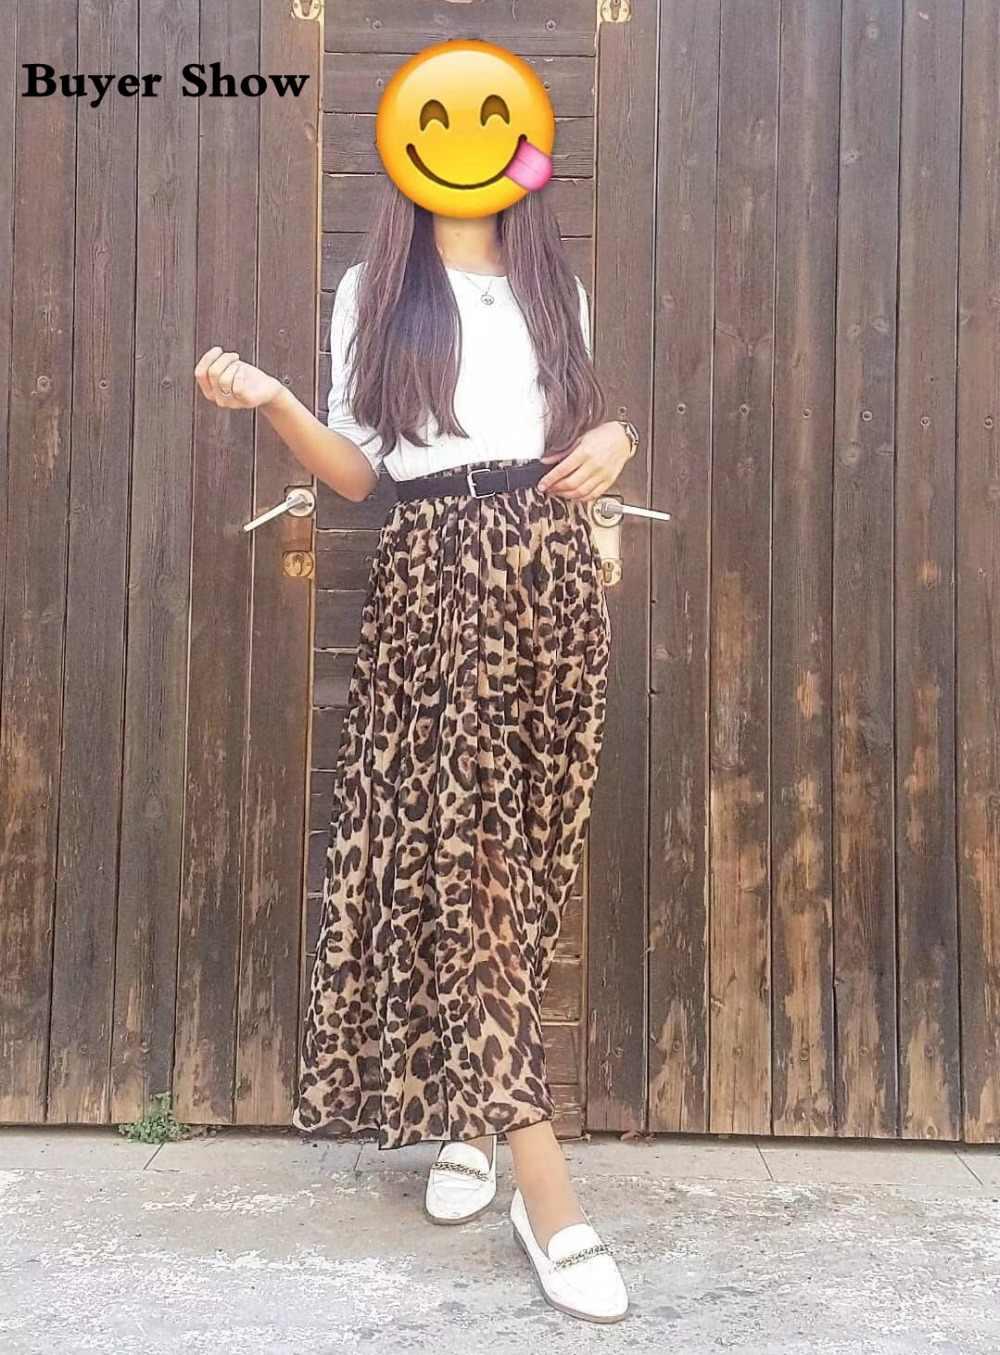 621407b9e ... TingYiLi Summer Women Long Leopard Print Skirt Elastic High Waist  Chiffon Pleated Slim Fit Casual Maxi